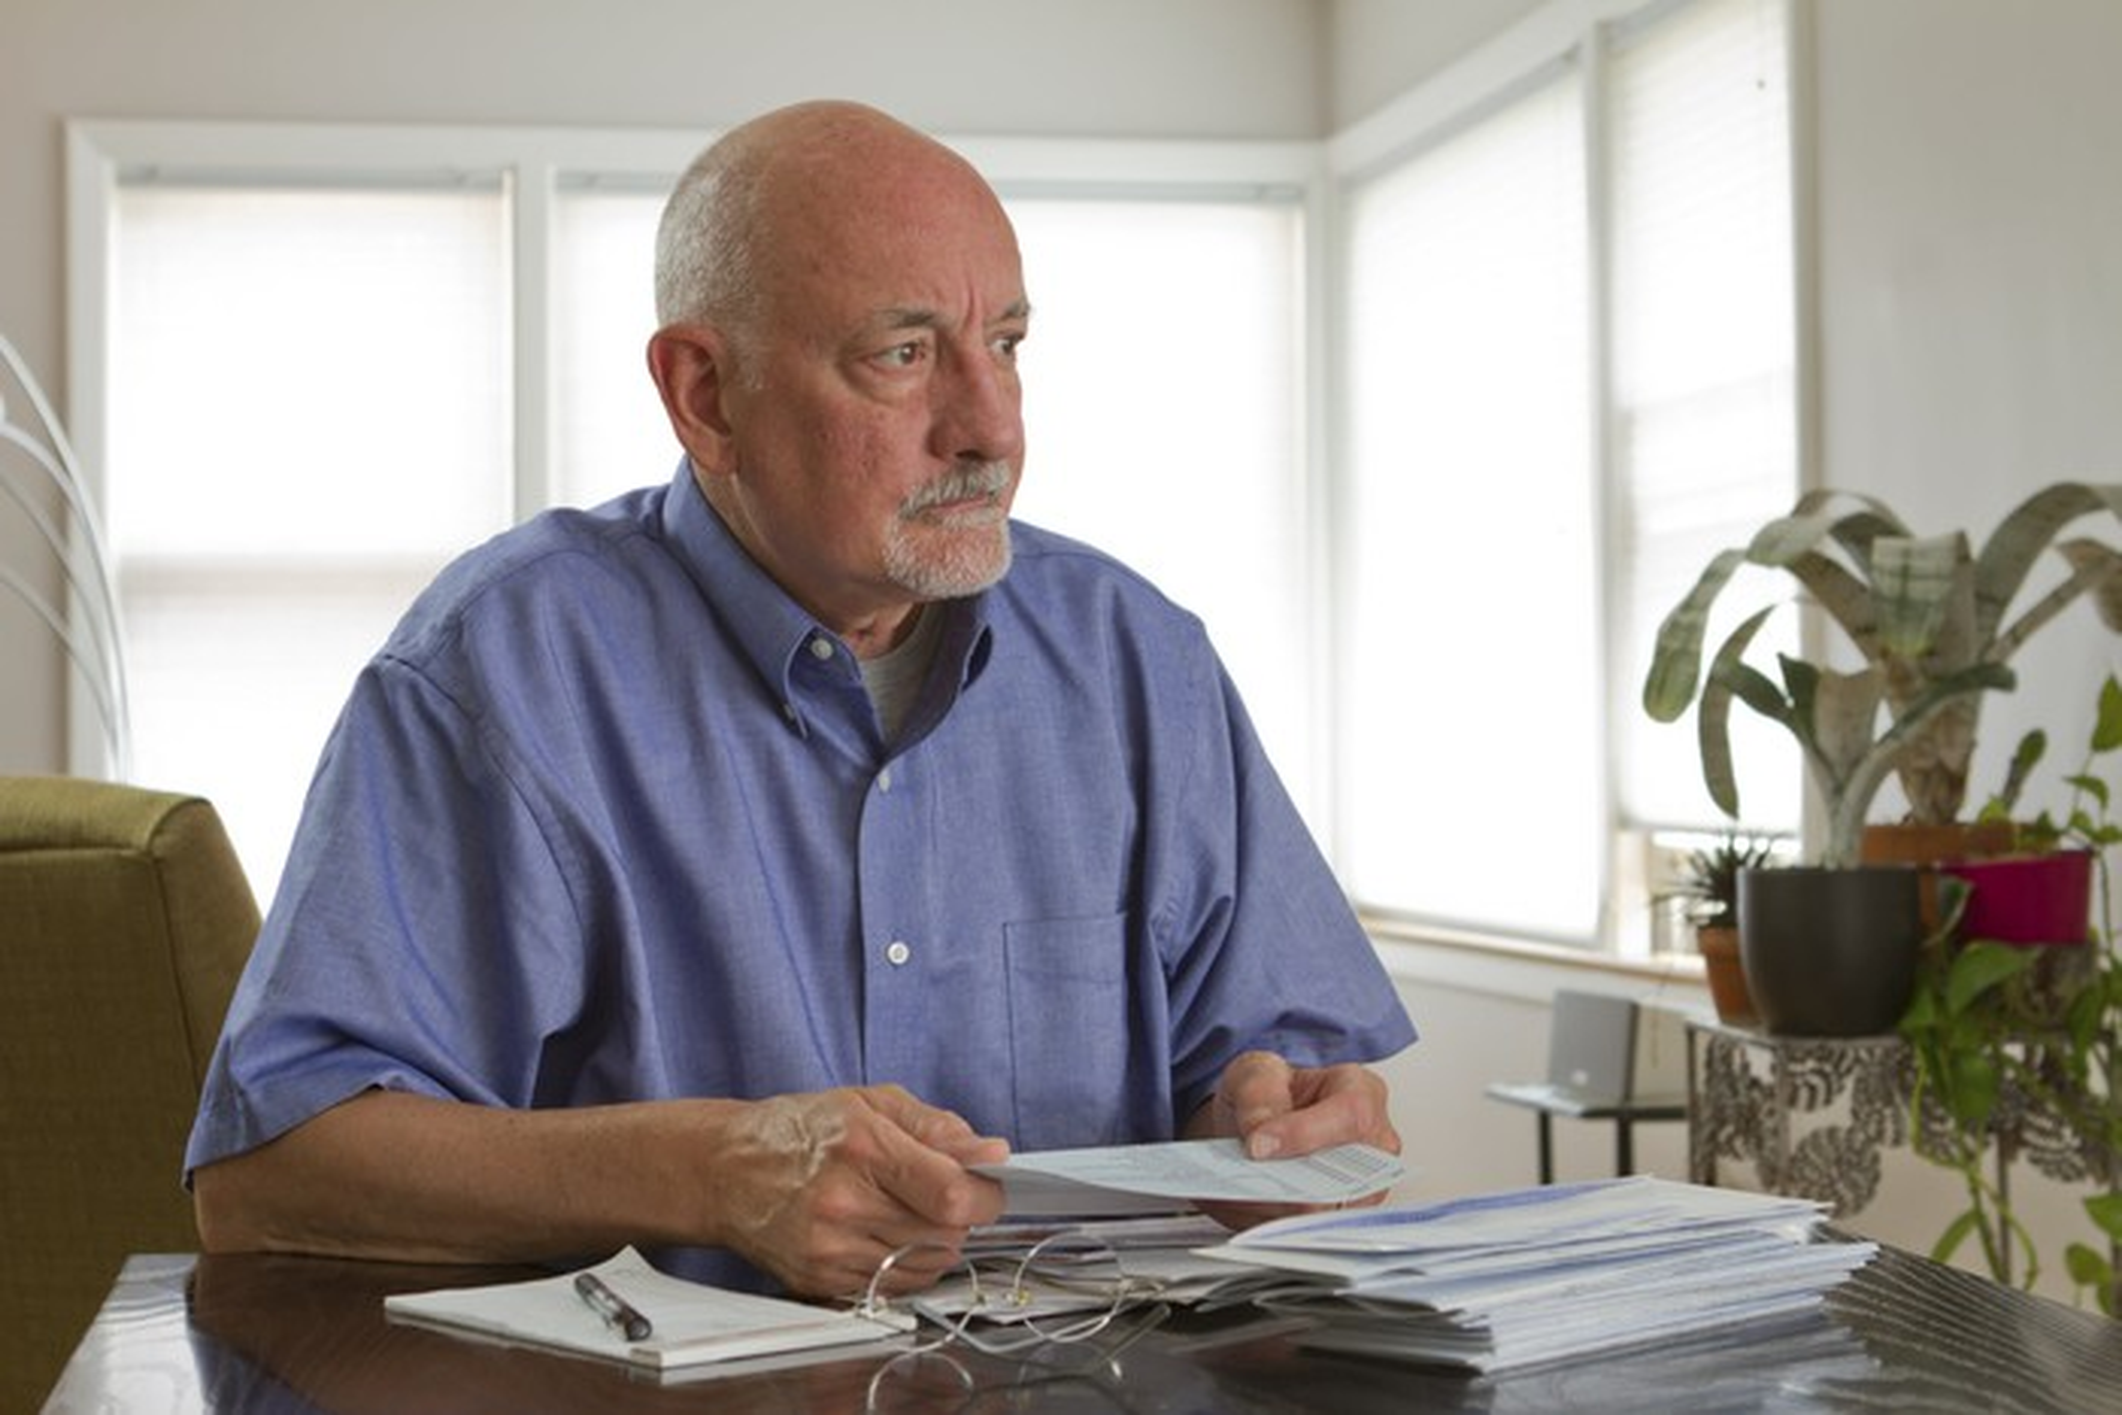 A worried elderly man examining his finances.